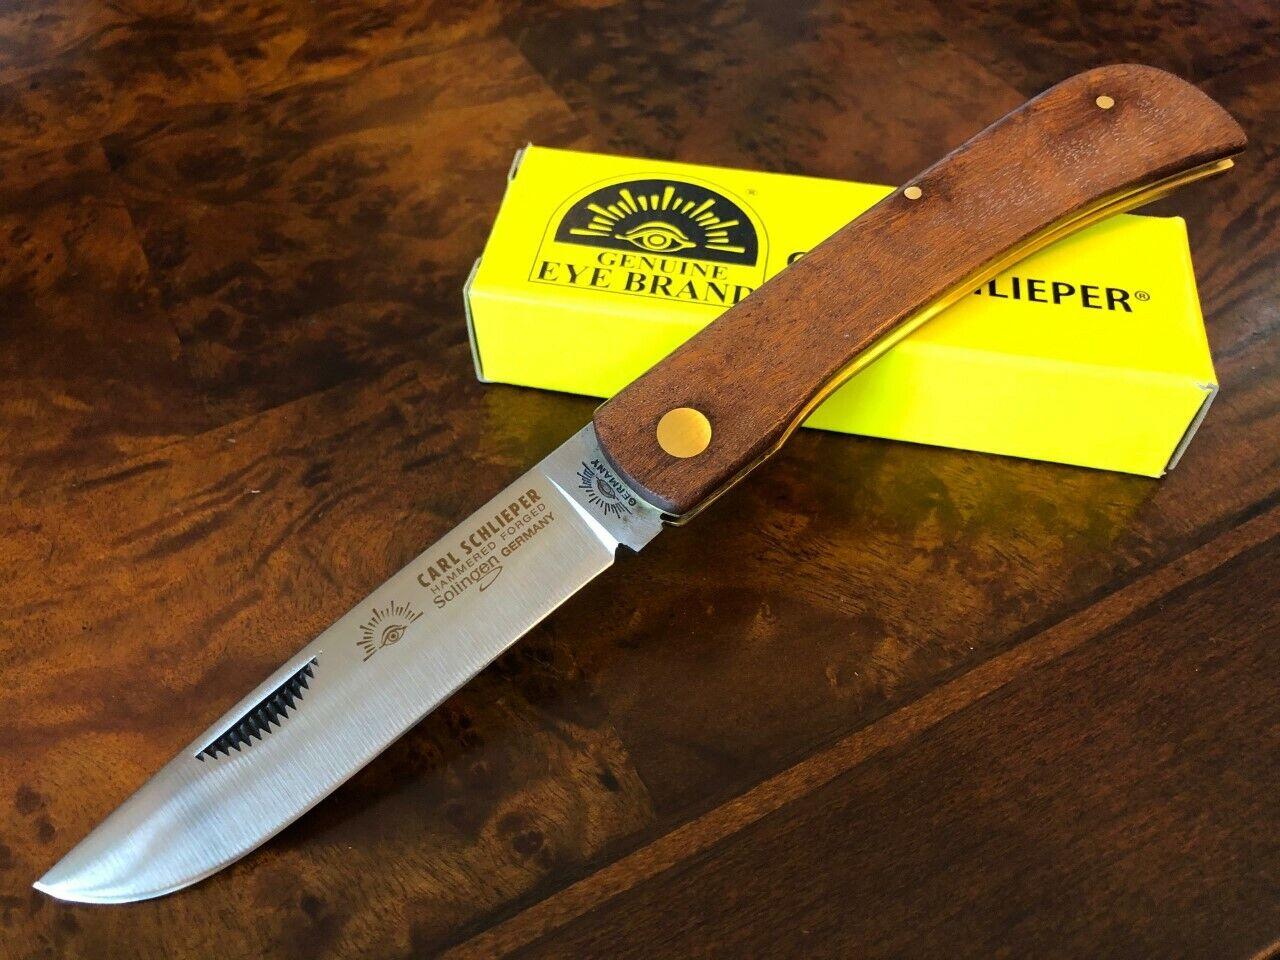 Carl Schlieper German Eye Brand Solingen Knife Large Clodbuster Wood Handle GE99